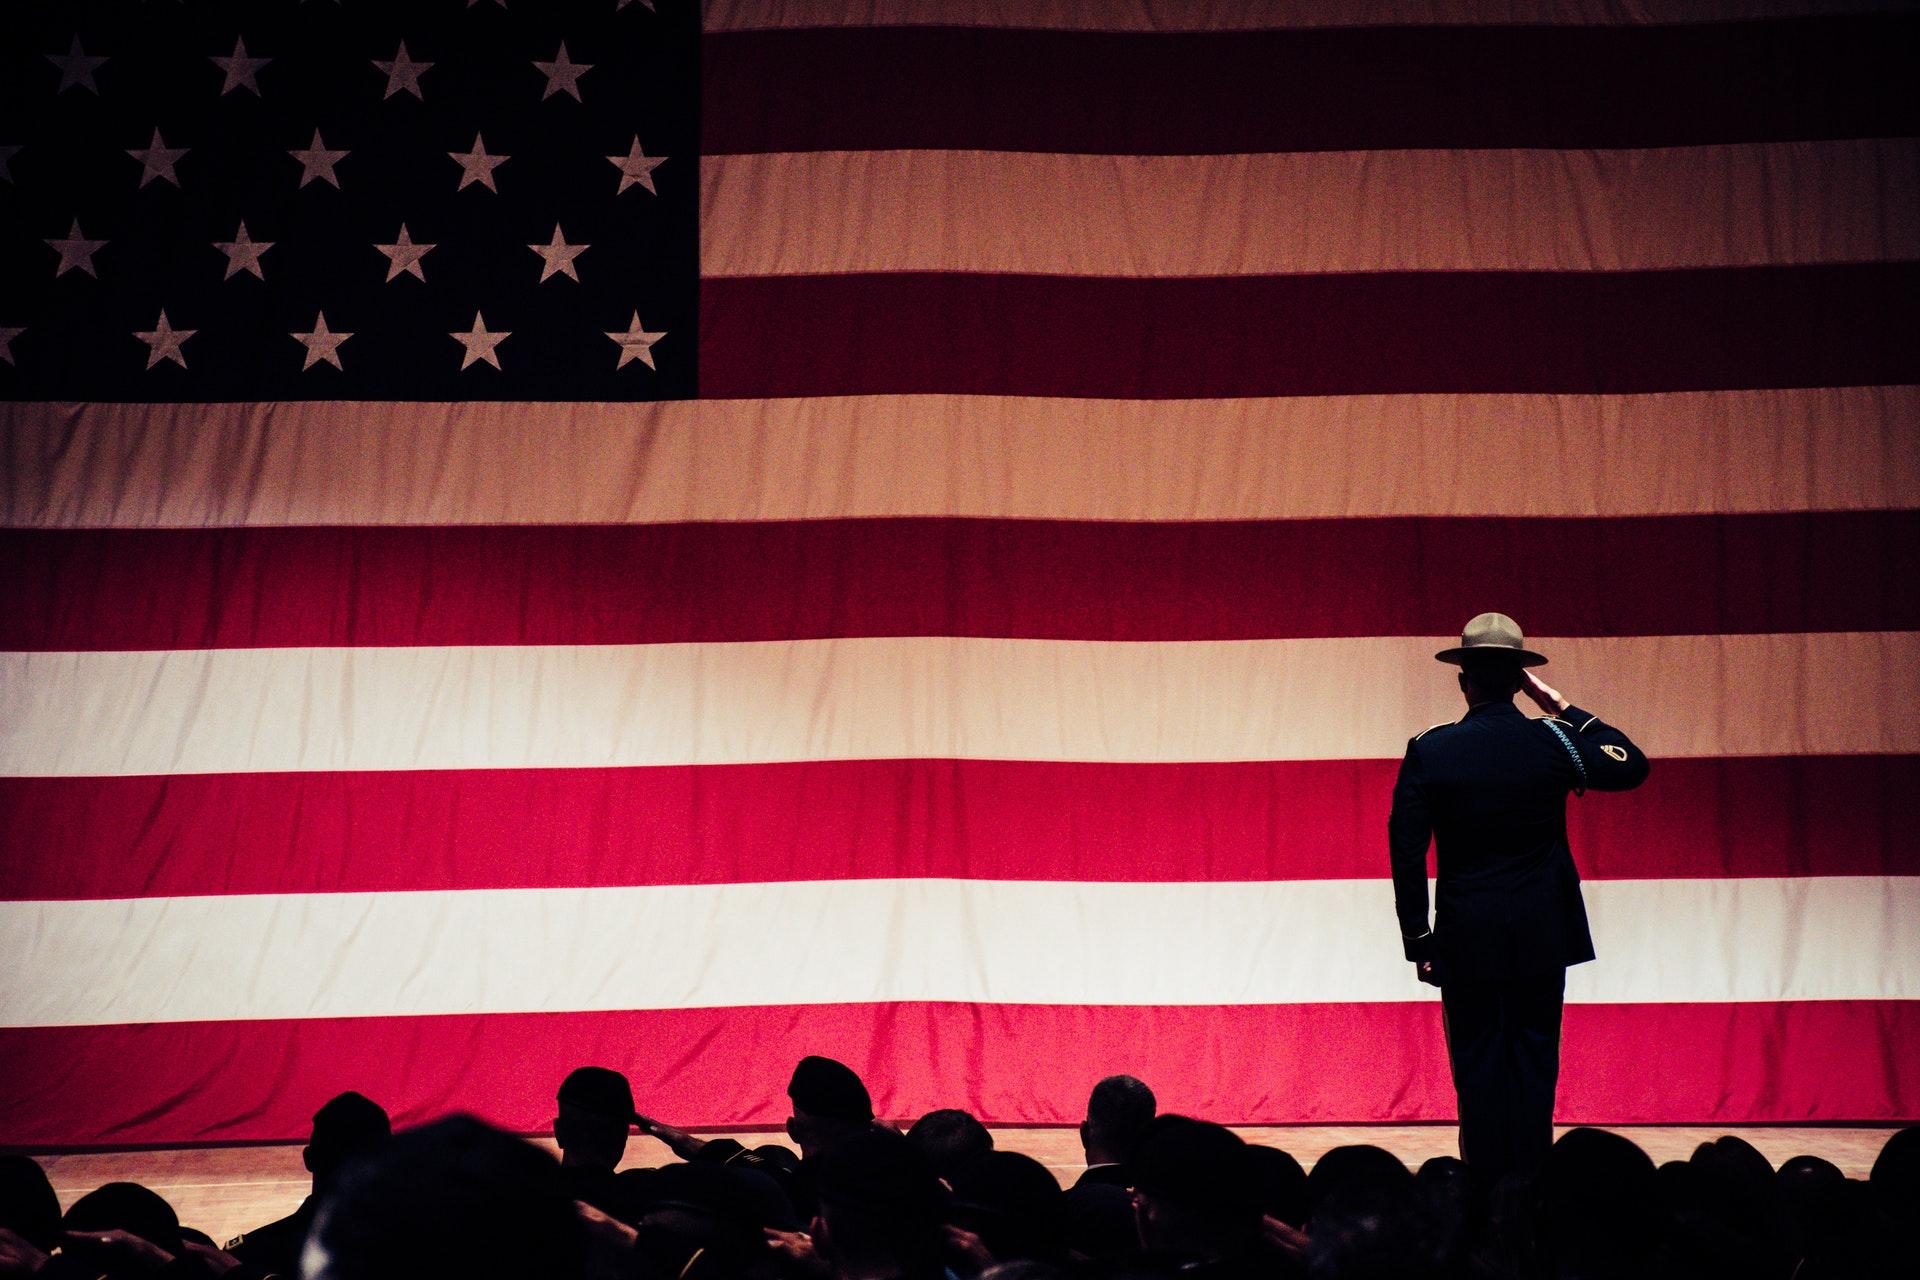 Honor Celebrate Memorial Day